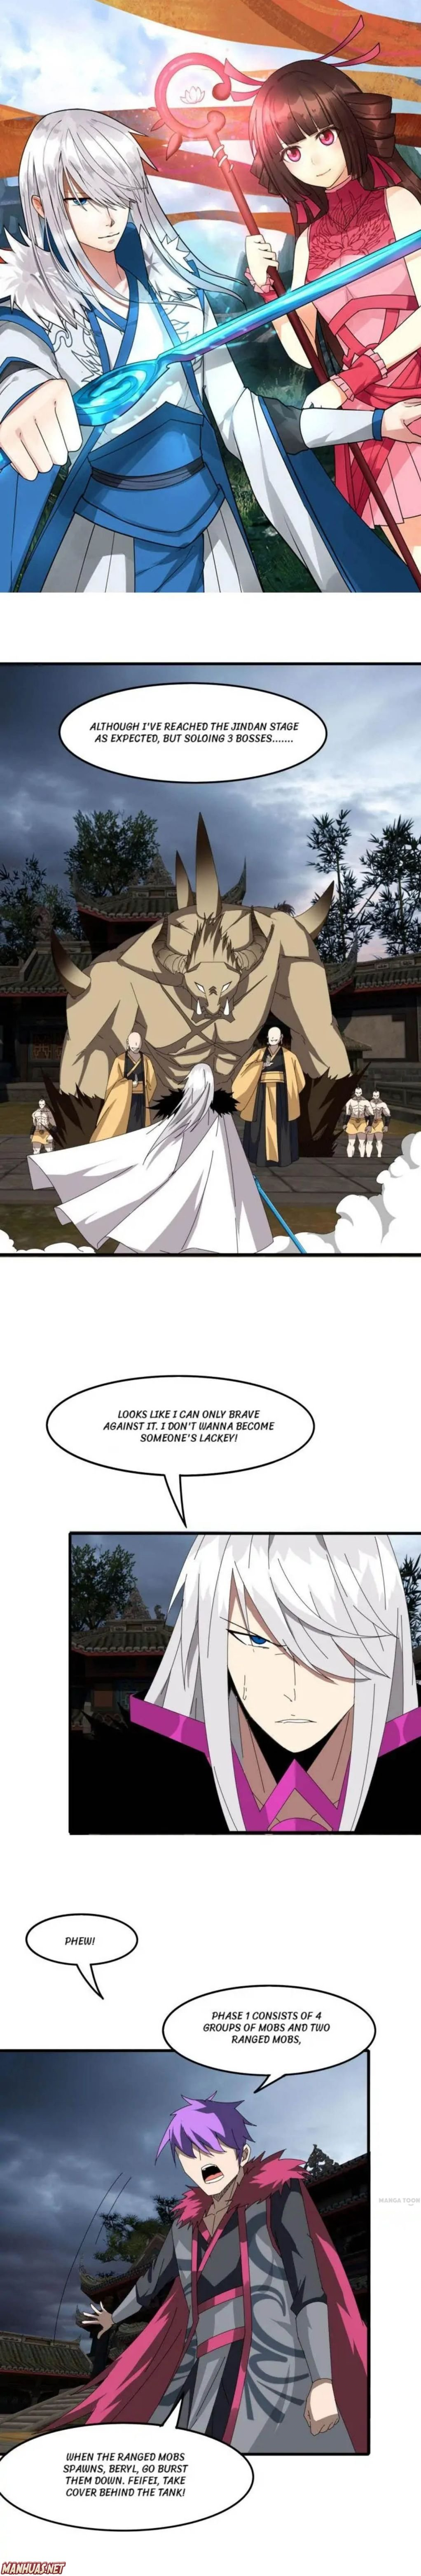 Manga Sword Of Benevolence - Chapter 58 Page 1